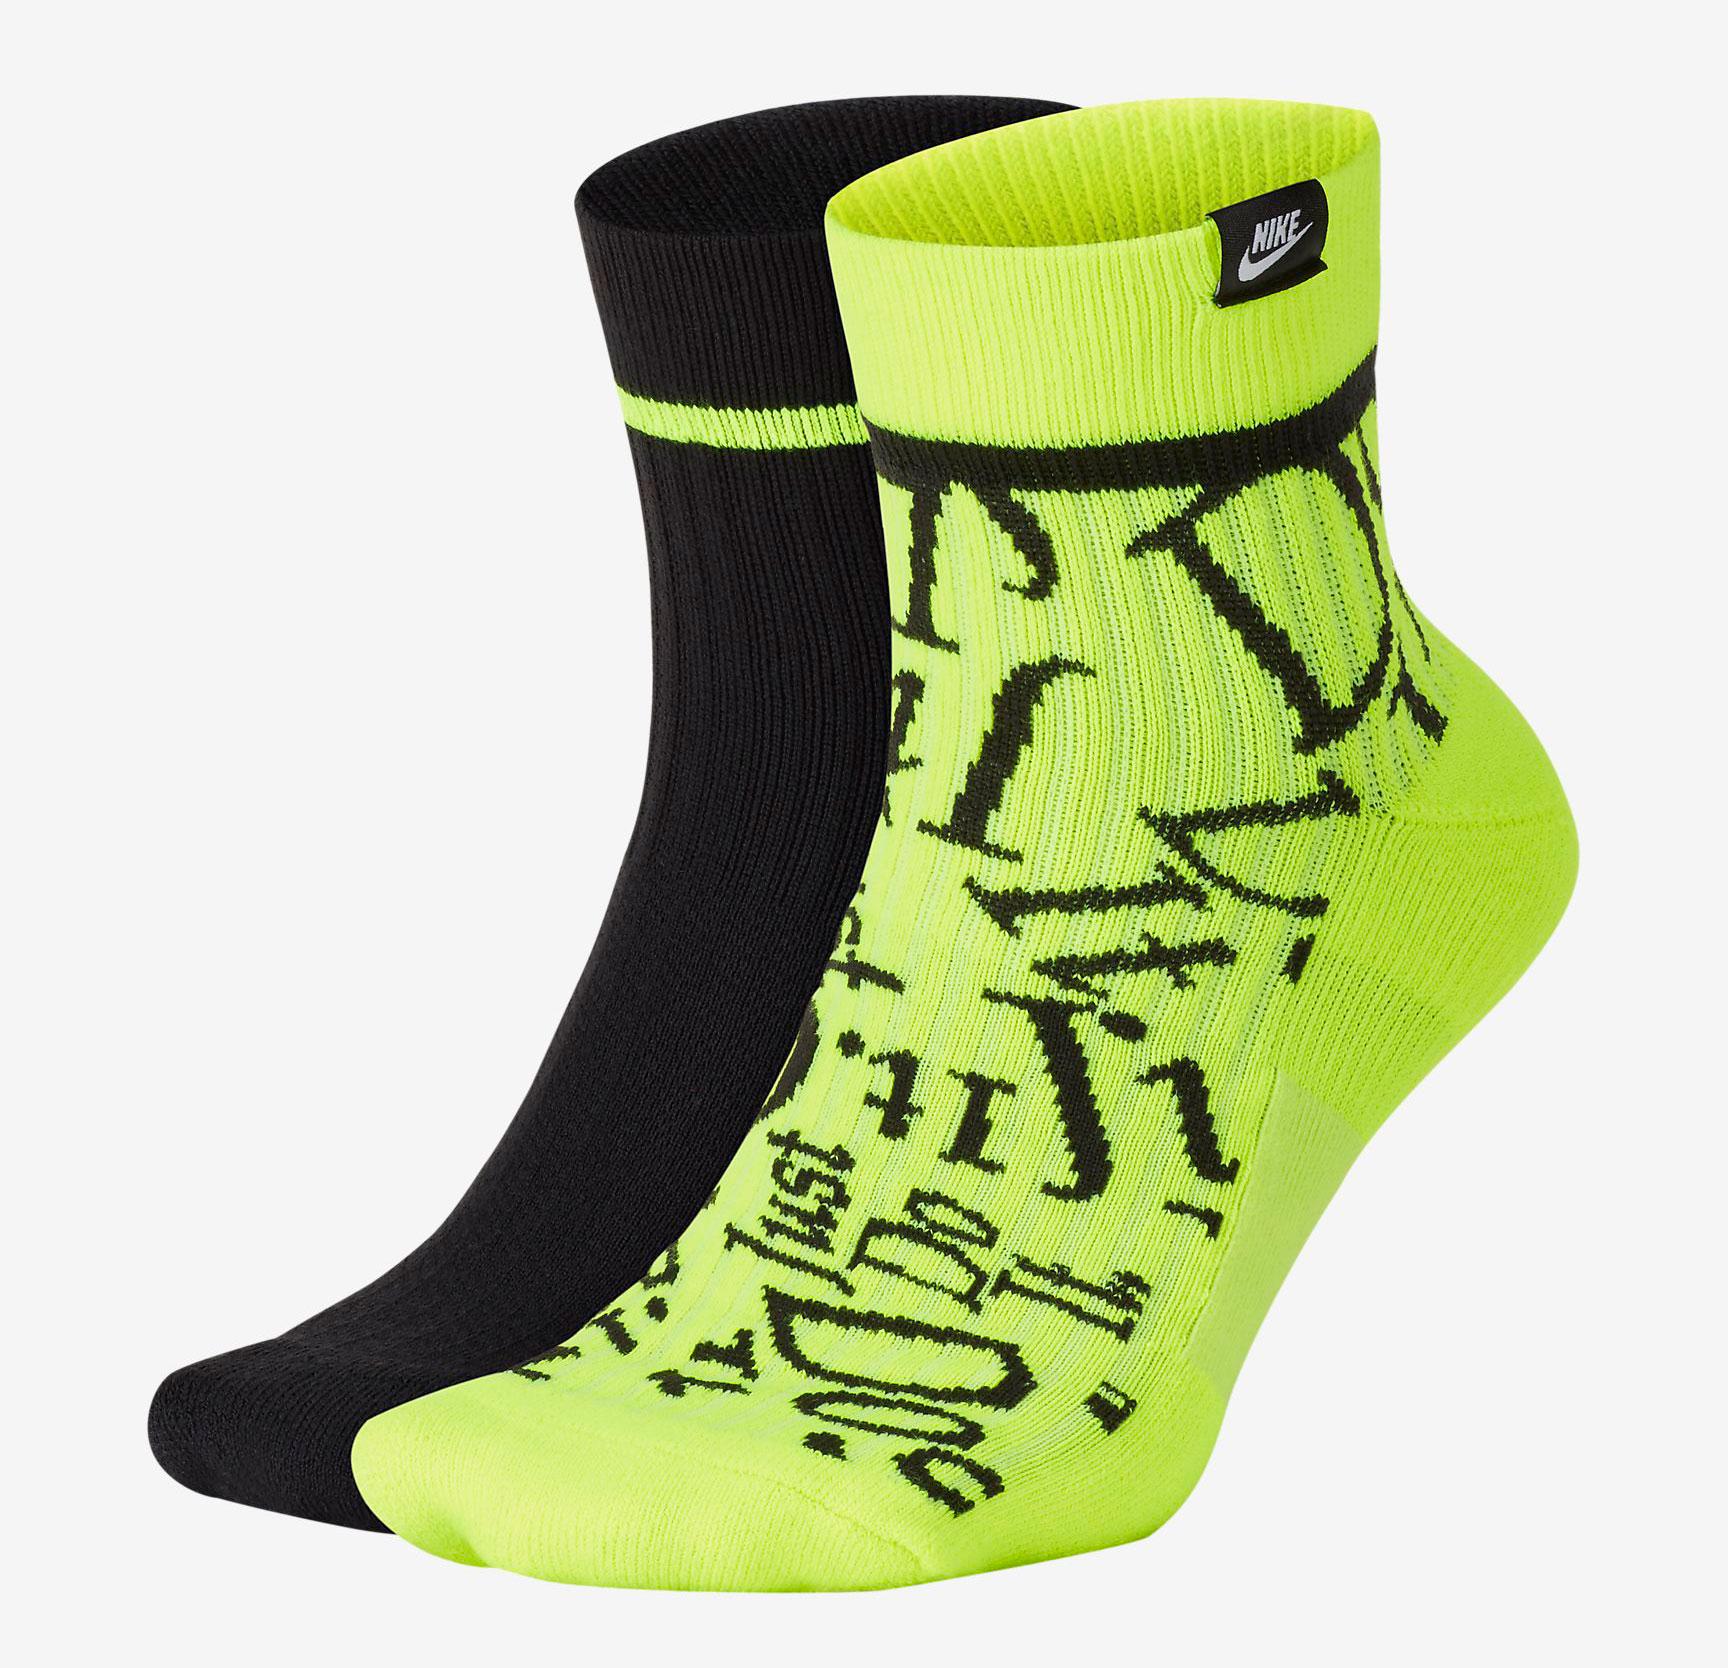 air-jordan-4-neon-volt-nike-socks